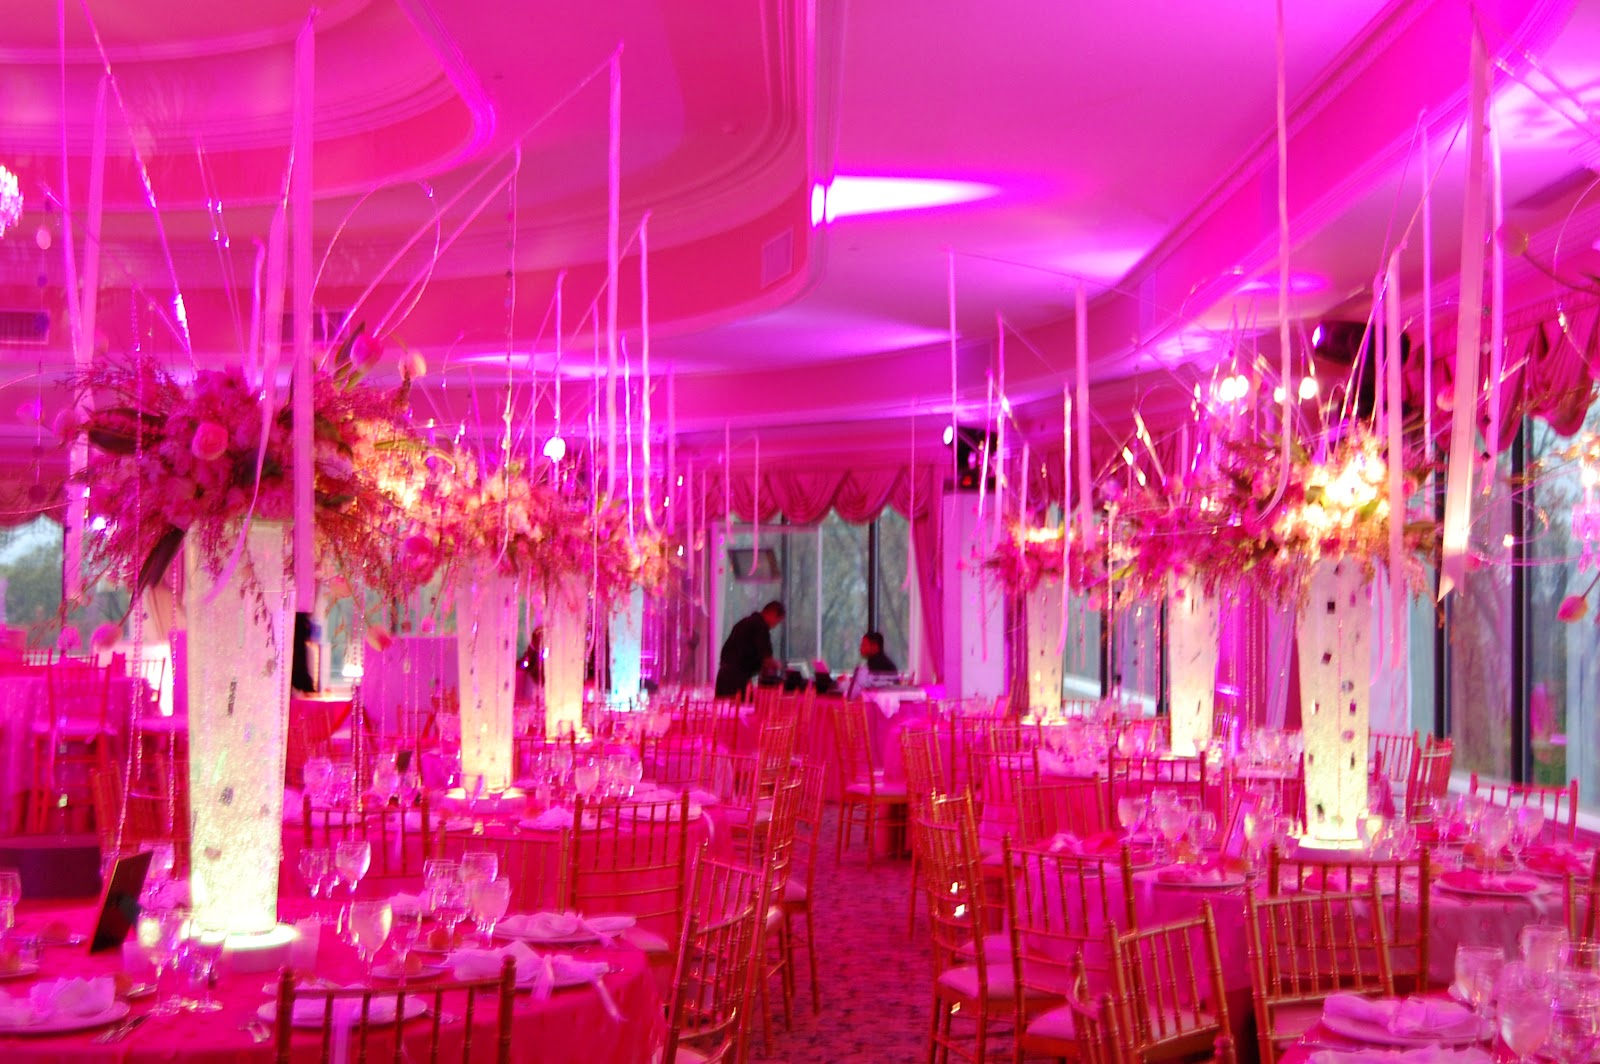 Led Lights For Wedding Decorations : wedding+led+lights,+wedding+led+light,+wedding+light.jpg